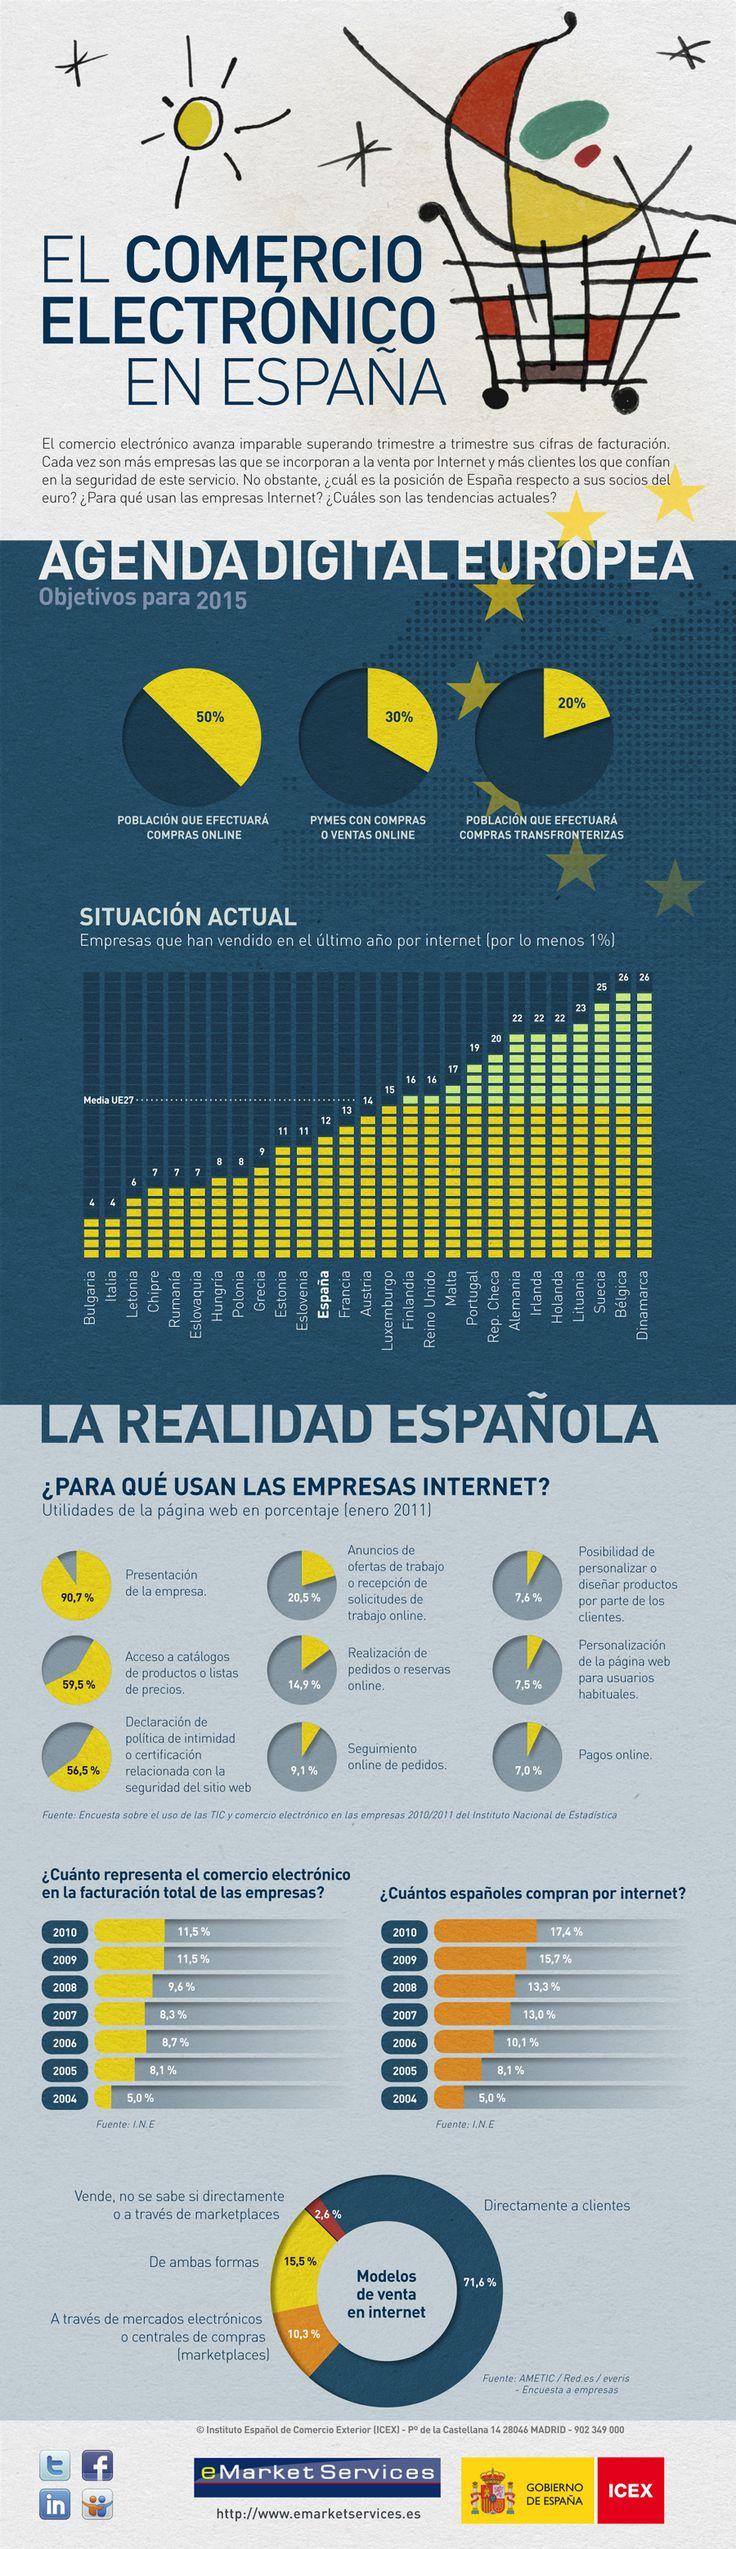 El comercio Electronico en España. #Infografia